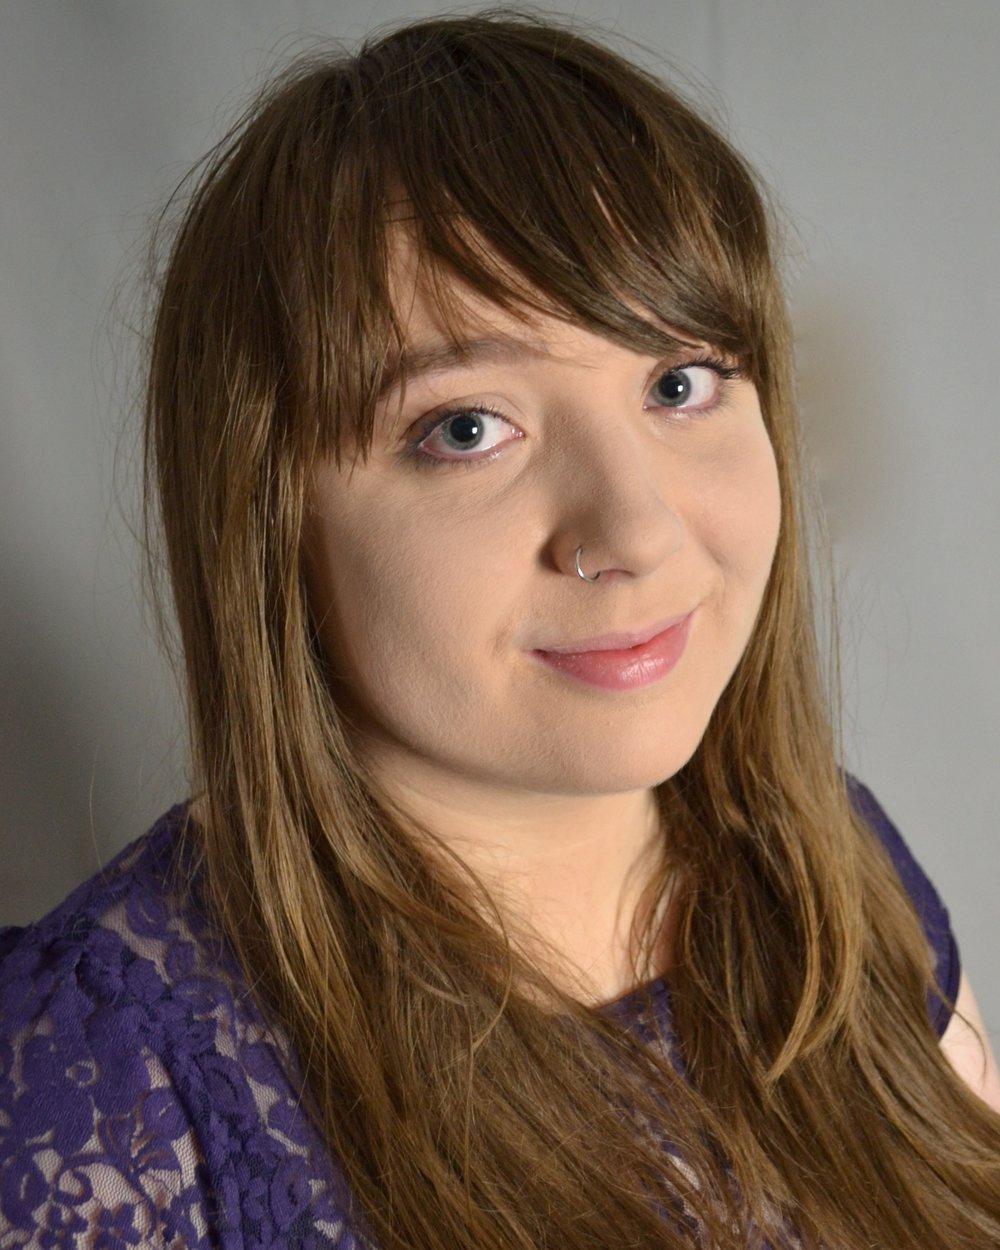 Vicky Sarsfield